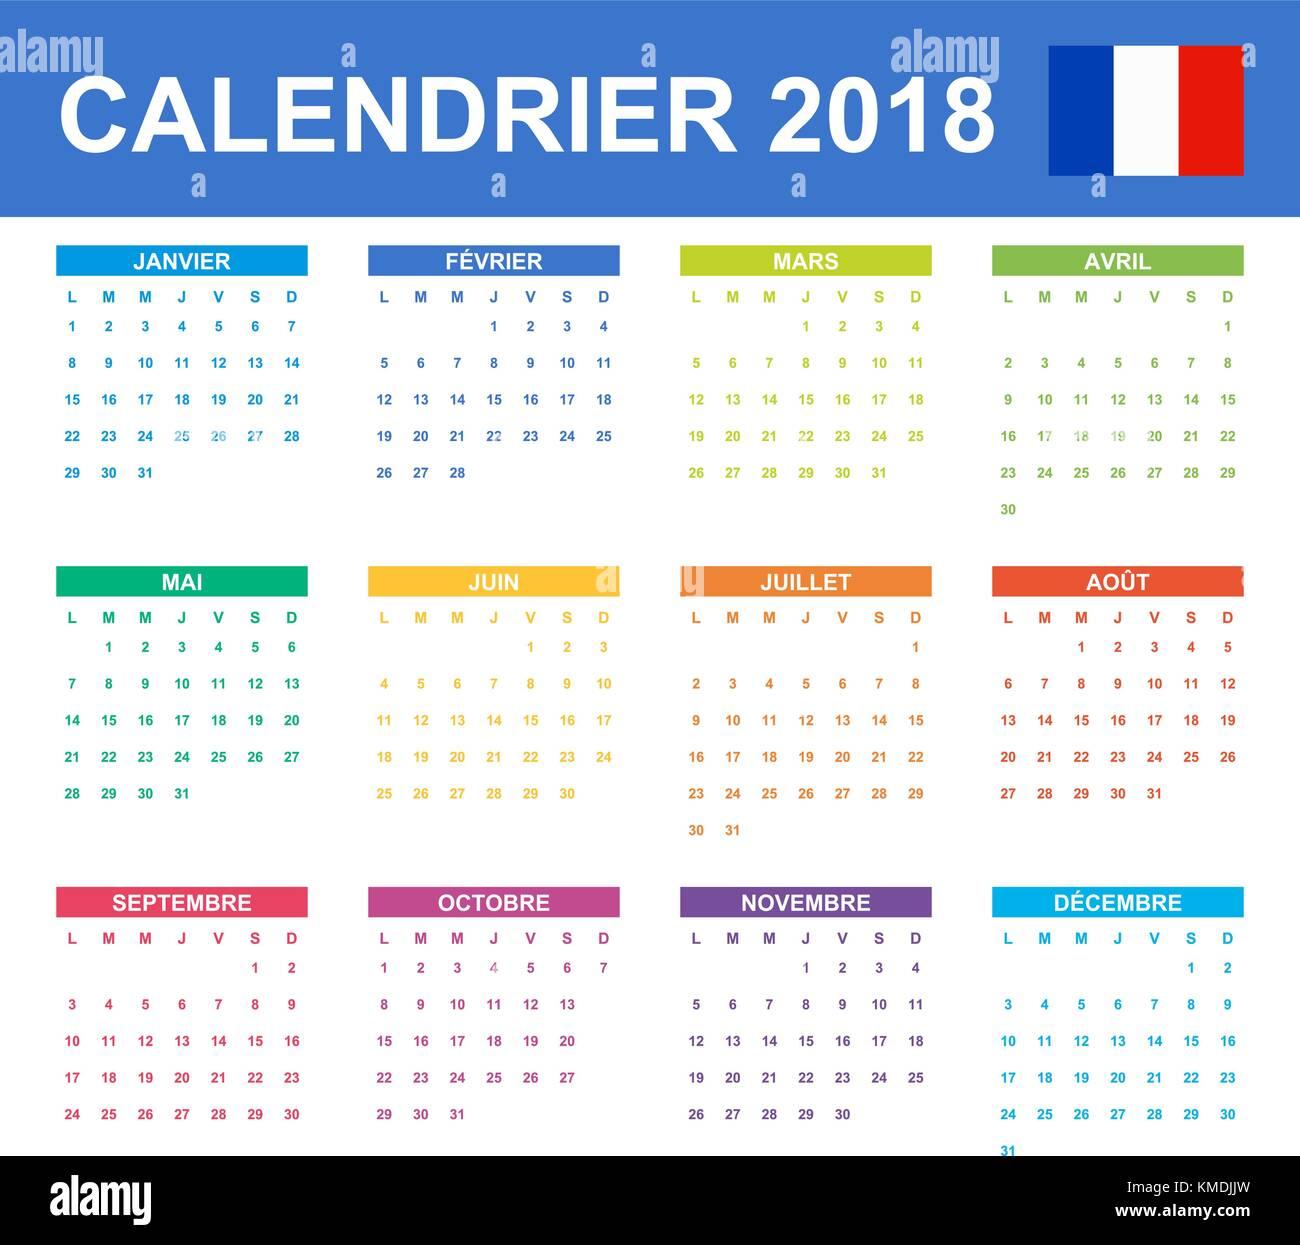 Calendario Frances.Calendario Frances Para 2018 Planificador Agenda O Agenda